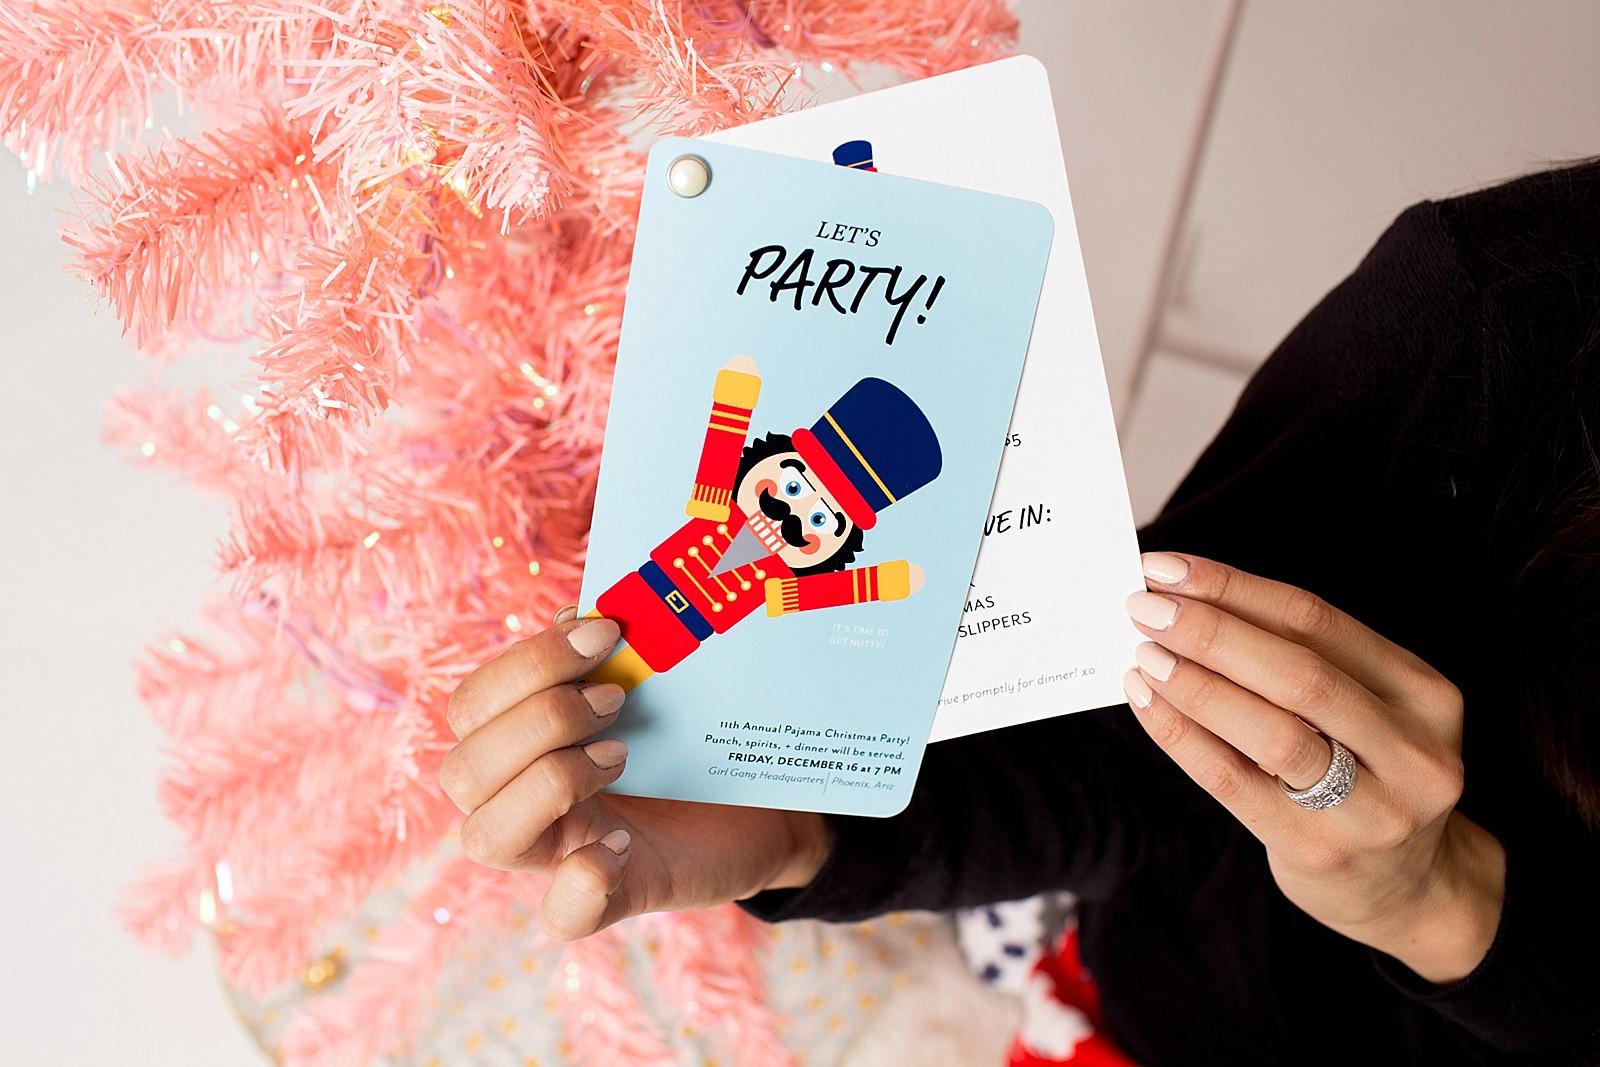 hanes-christmas-pajamas-girls-pajama-party-ideas-cute-jammies-diana-elizabeth-lifestyle-fashion-blogger-phoenix-arizona-1746